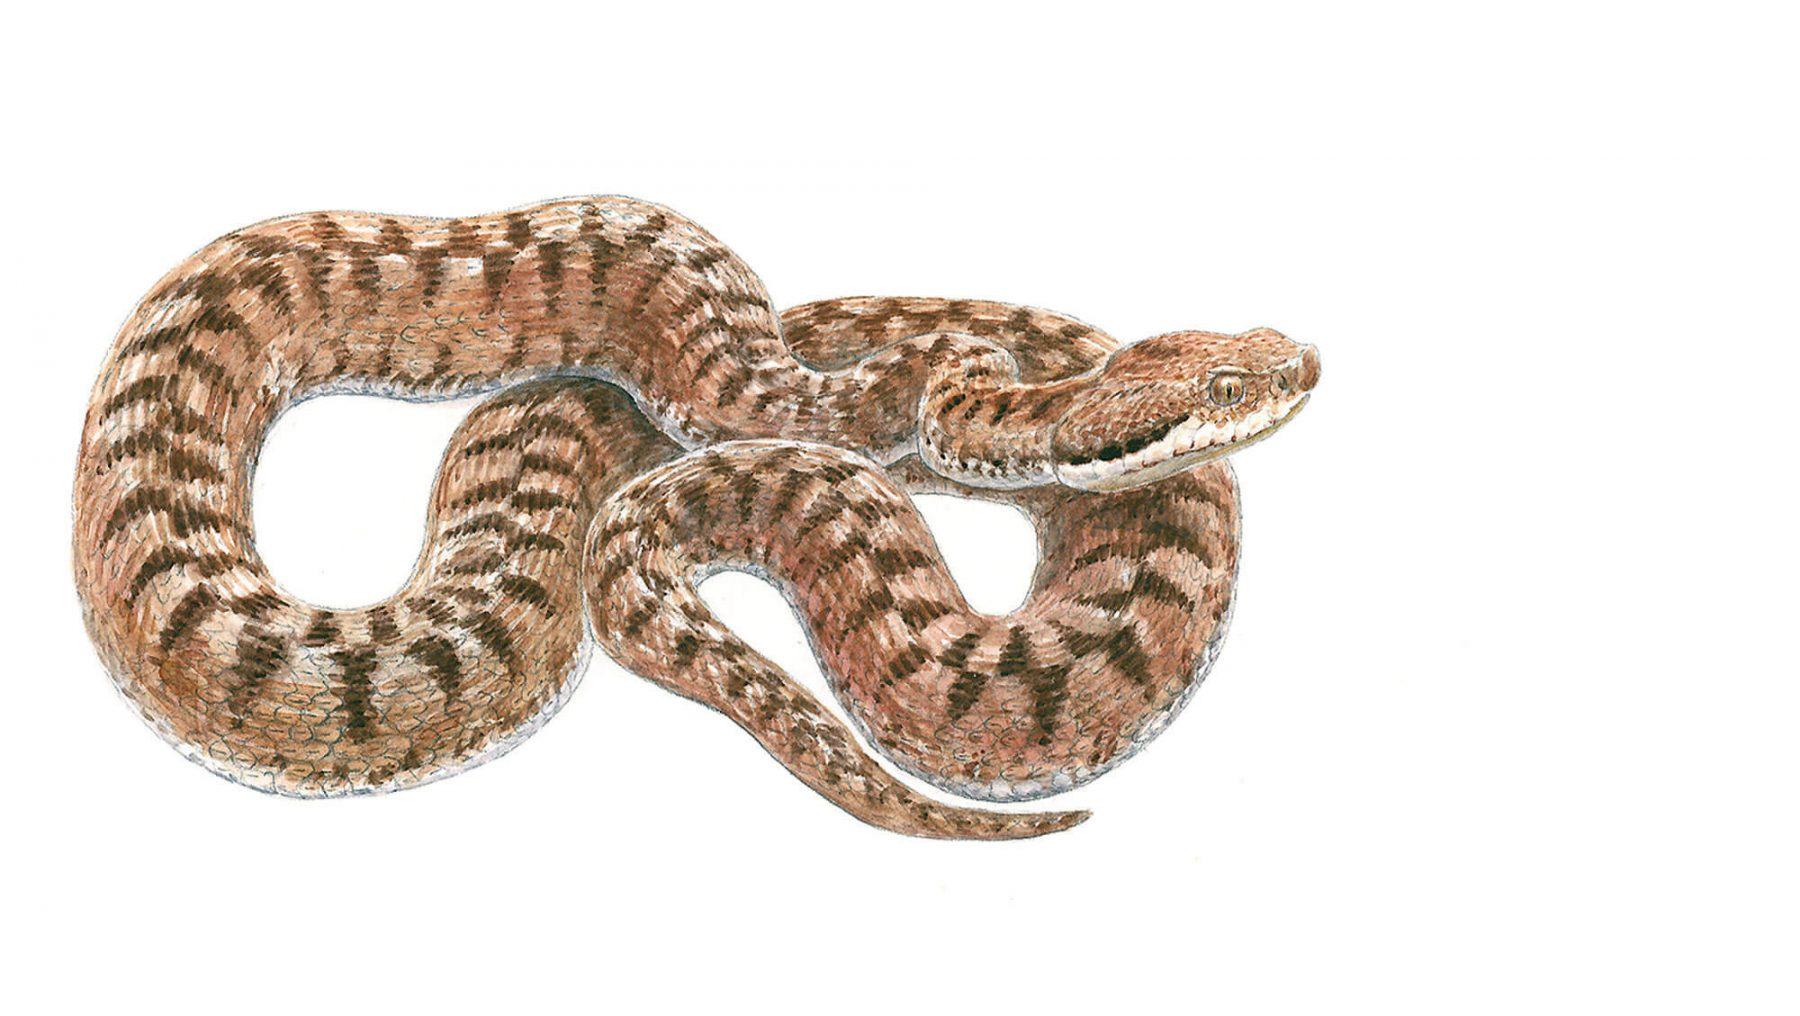 Chaud devant voici la vip re aspic la salamandre - Dessin de vipere ...